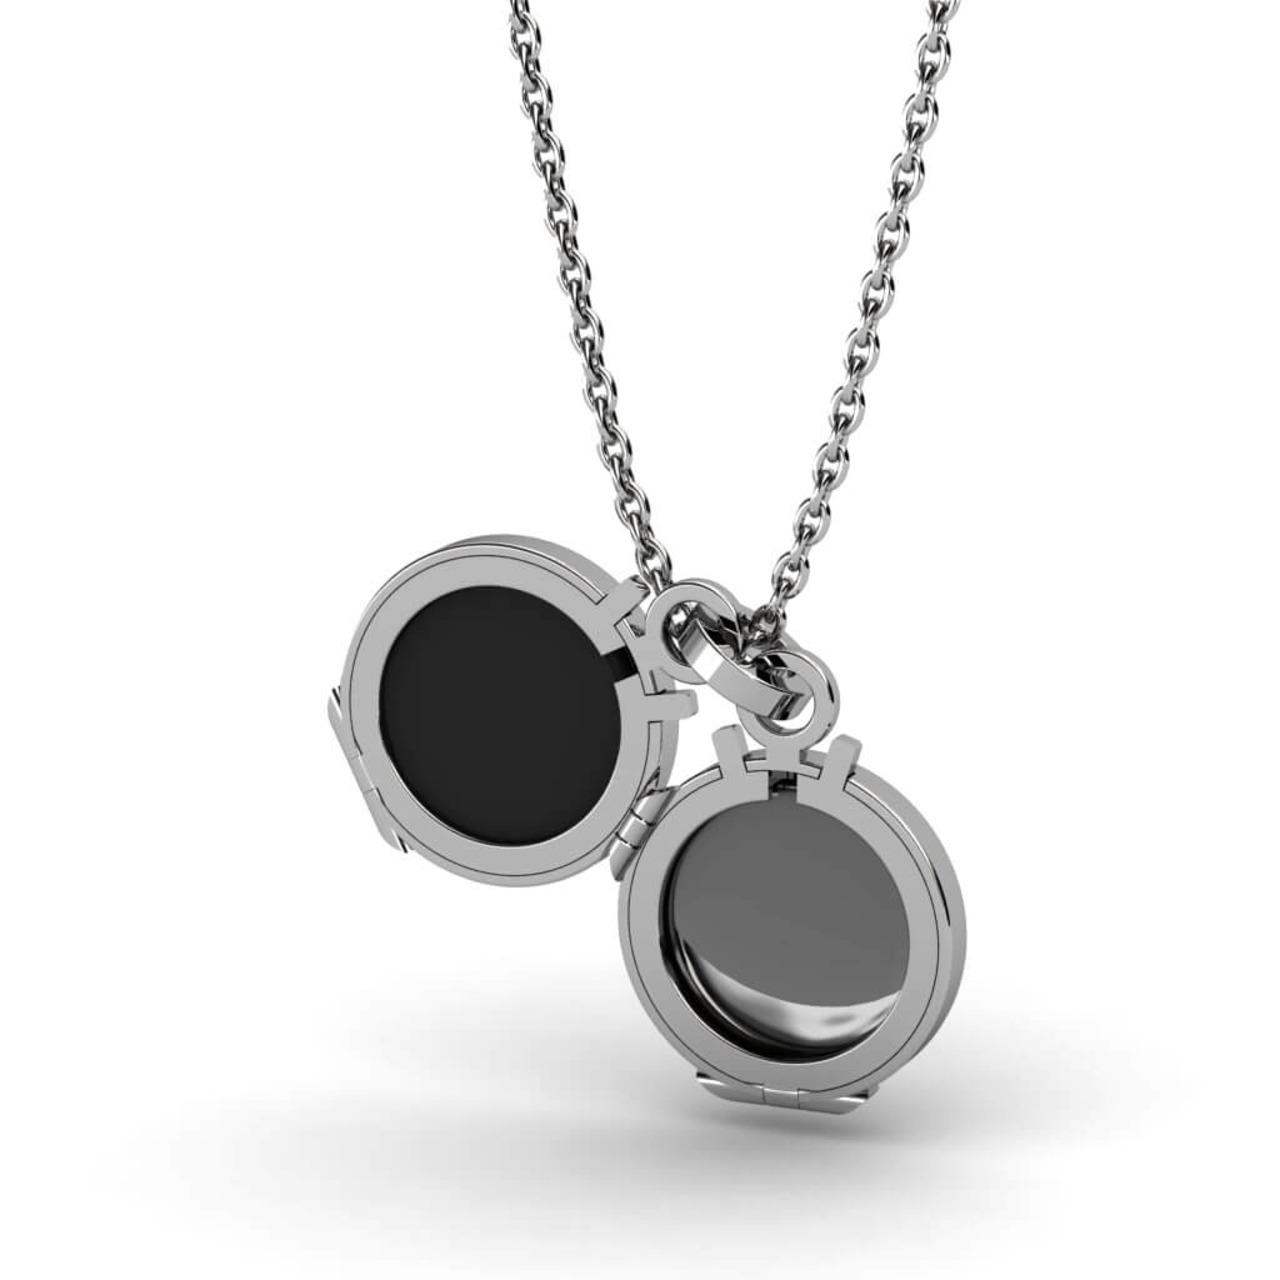 NFC Locket Necklaces